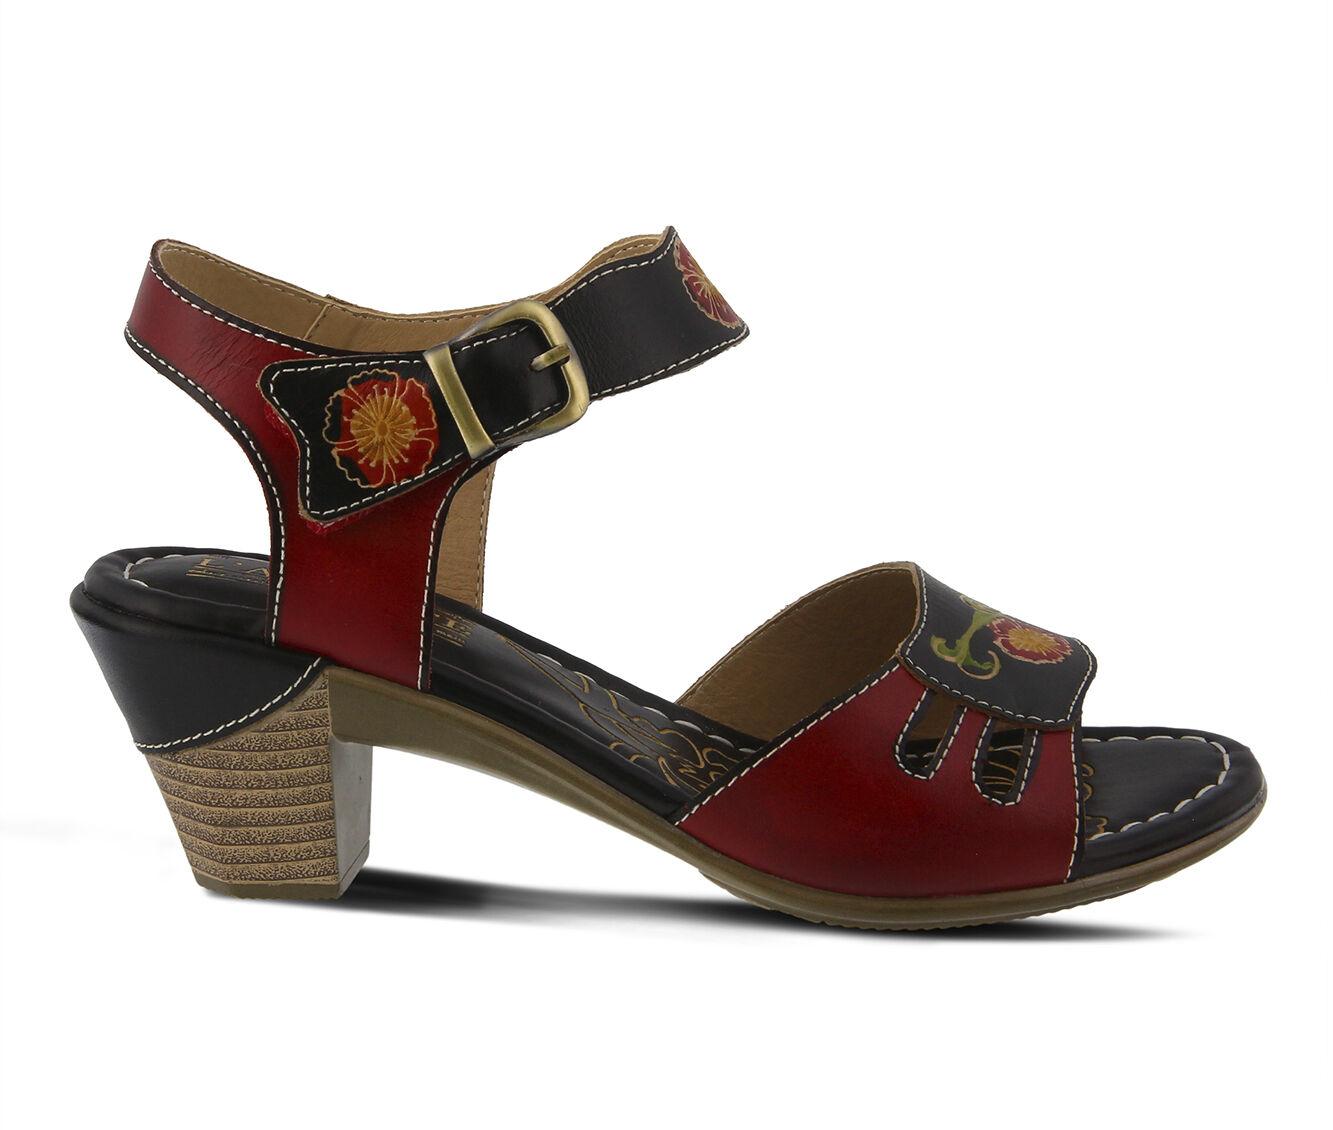 uk shoes_kd6647